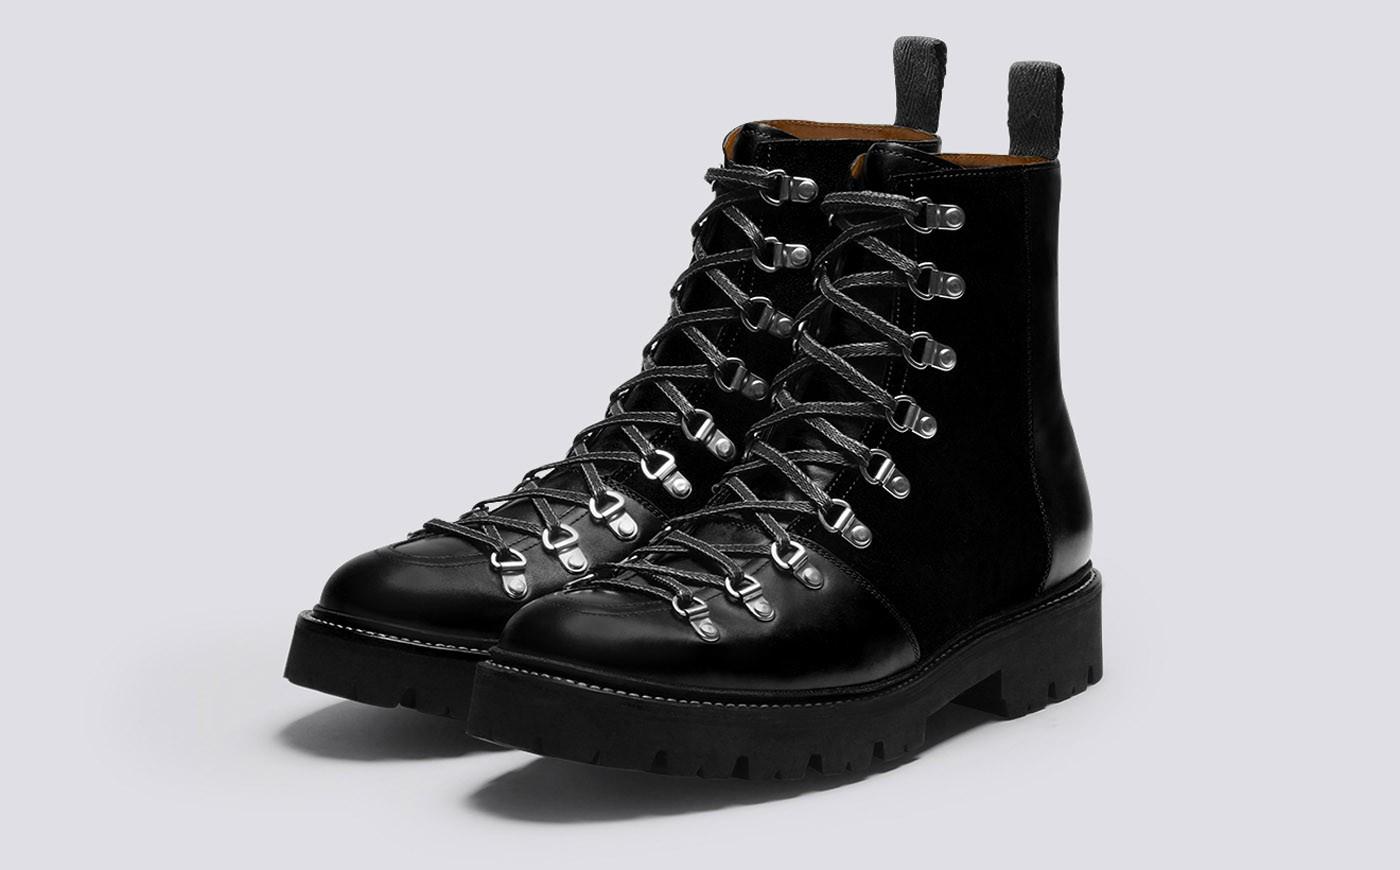 Boot Season? No Problem!: Grenson Brady Boots